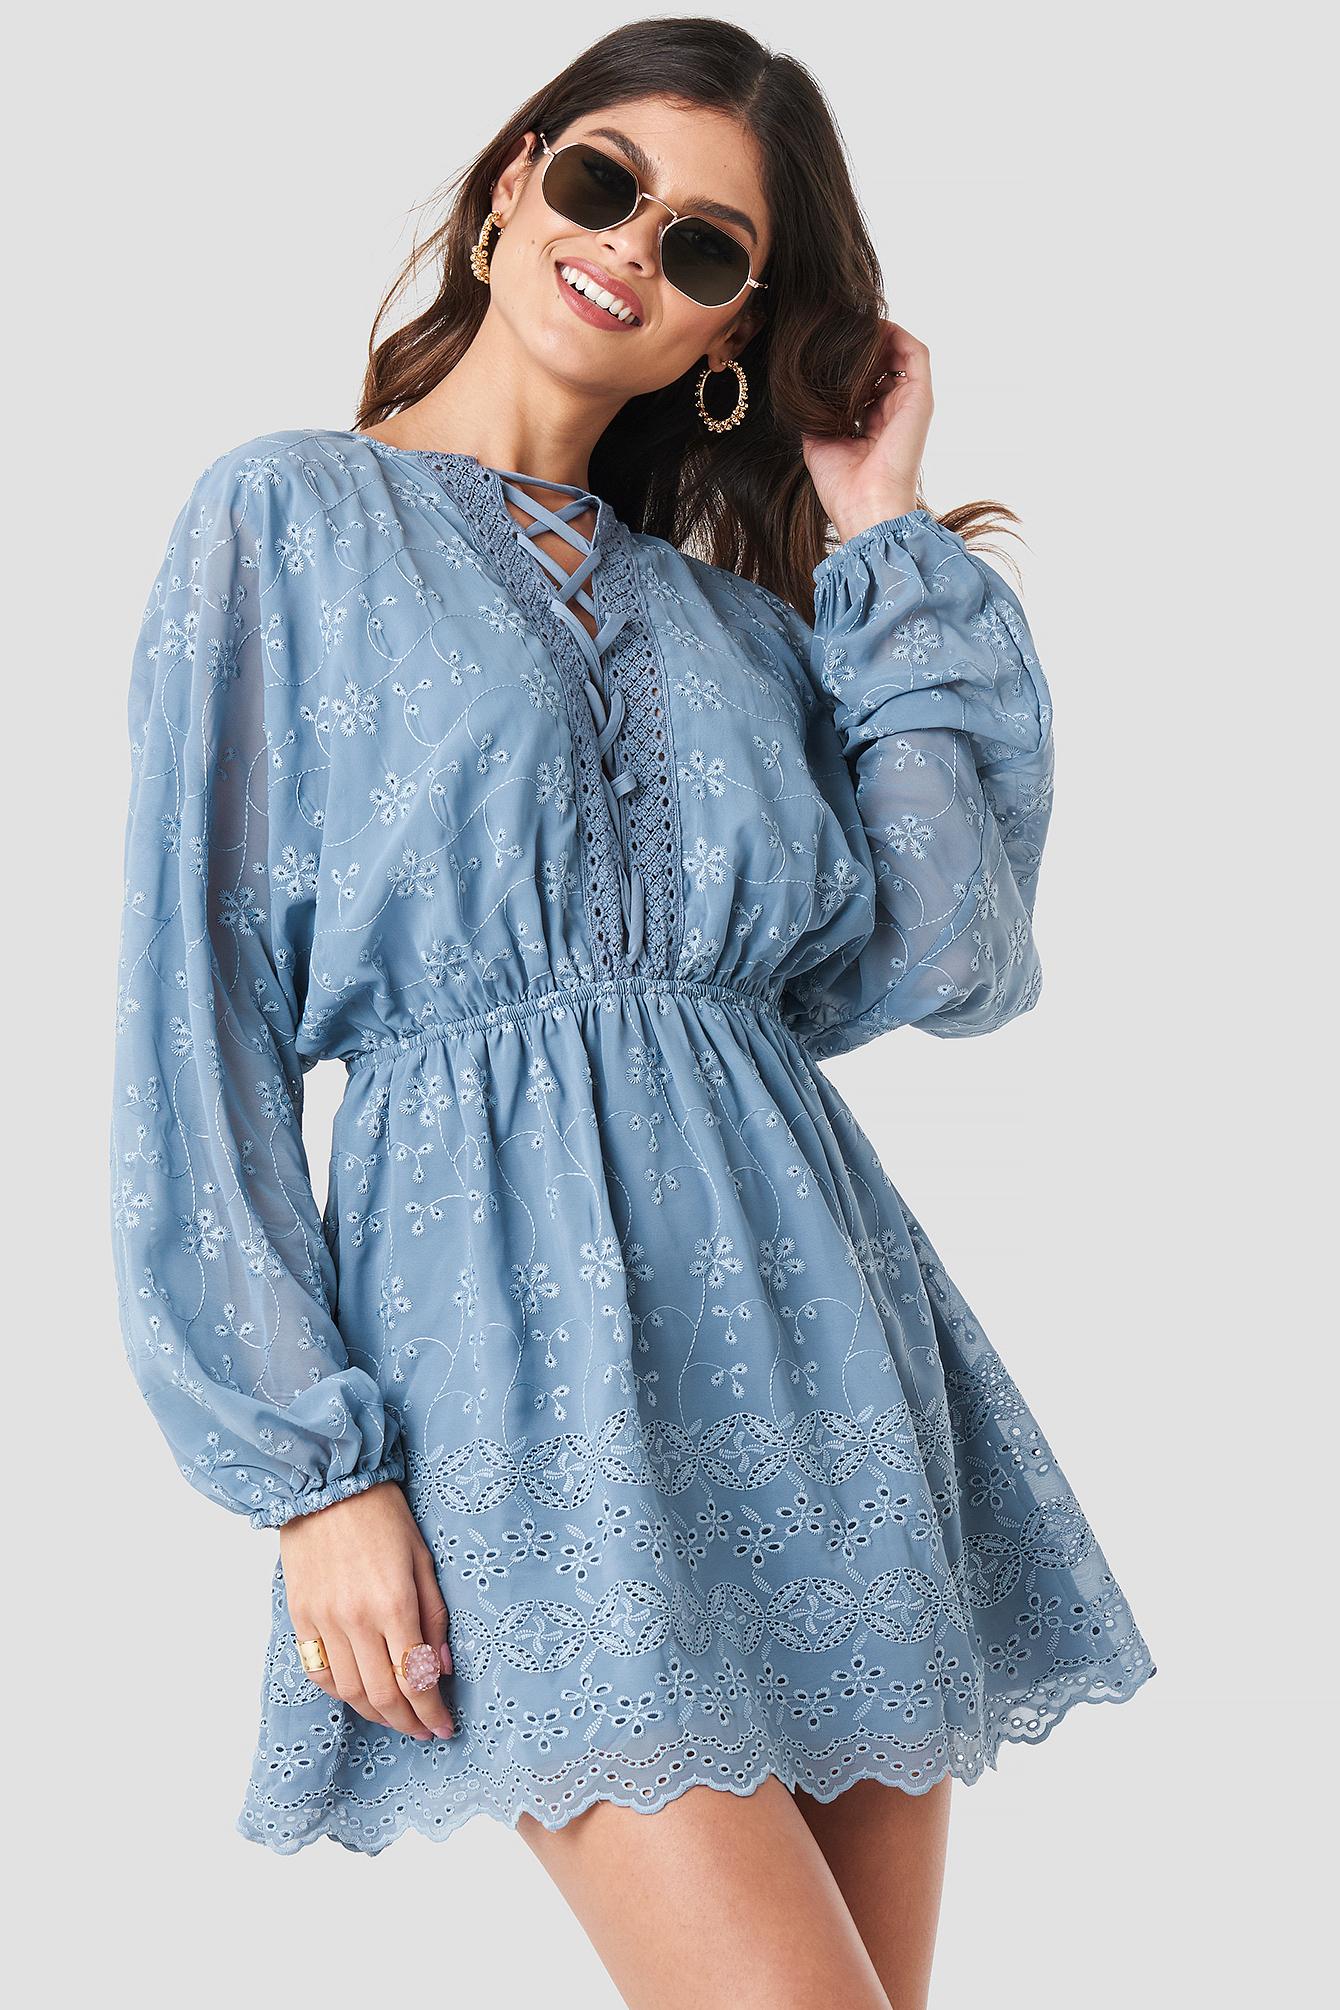 Lace Up Lace Dress NA-KD.COM